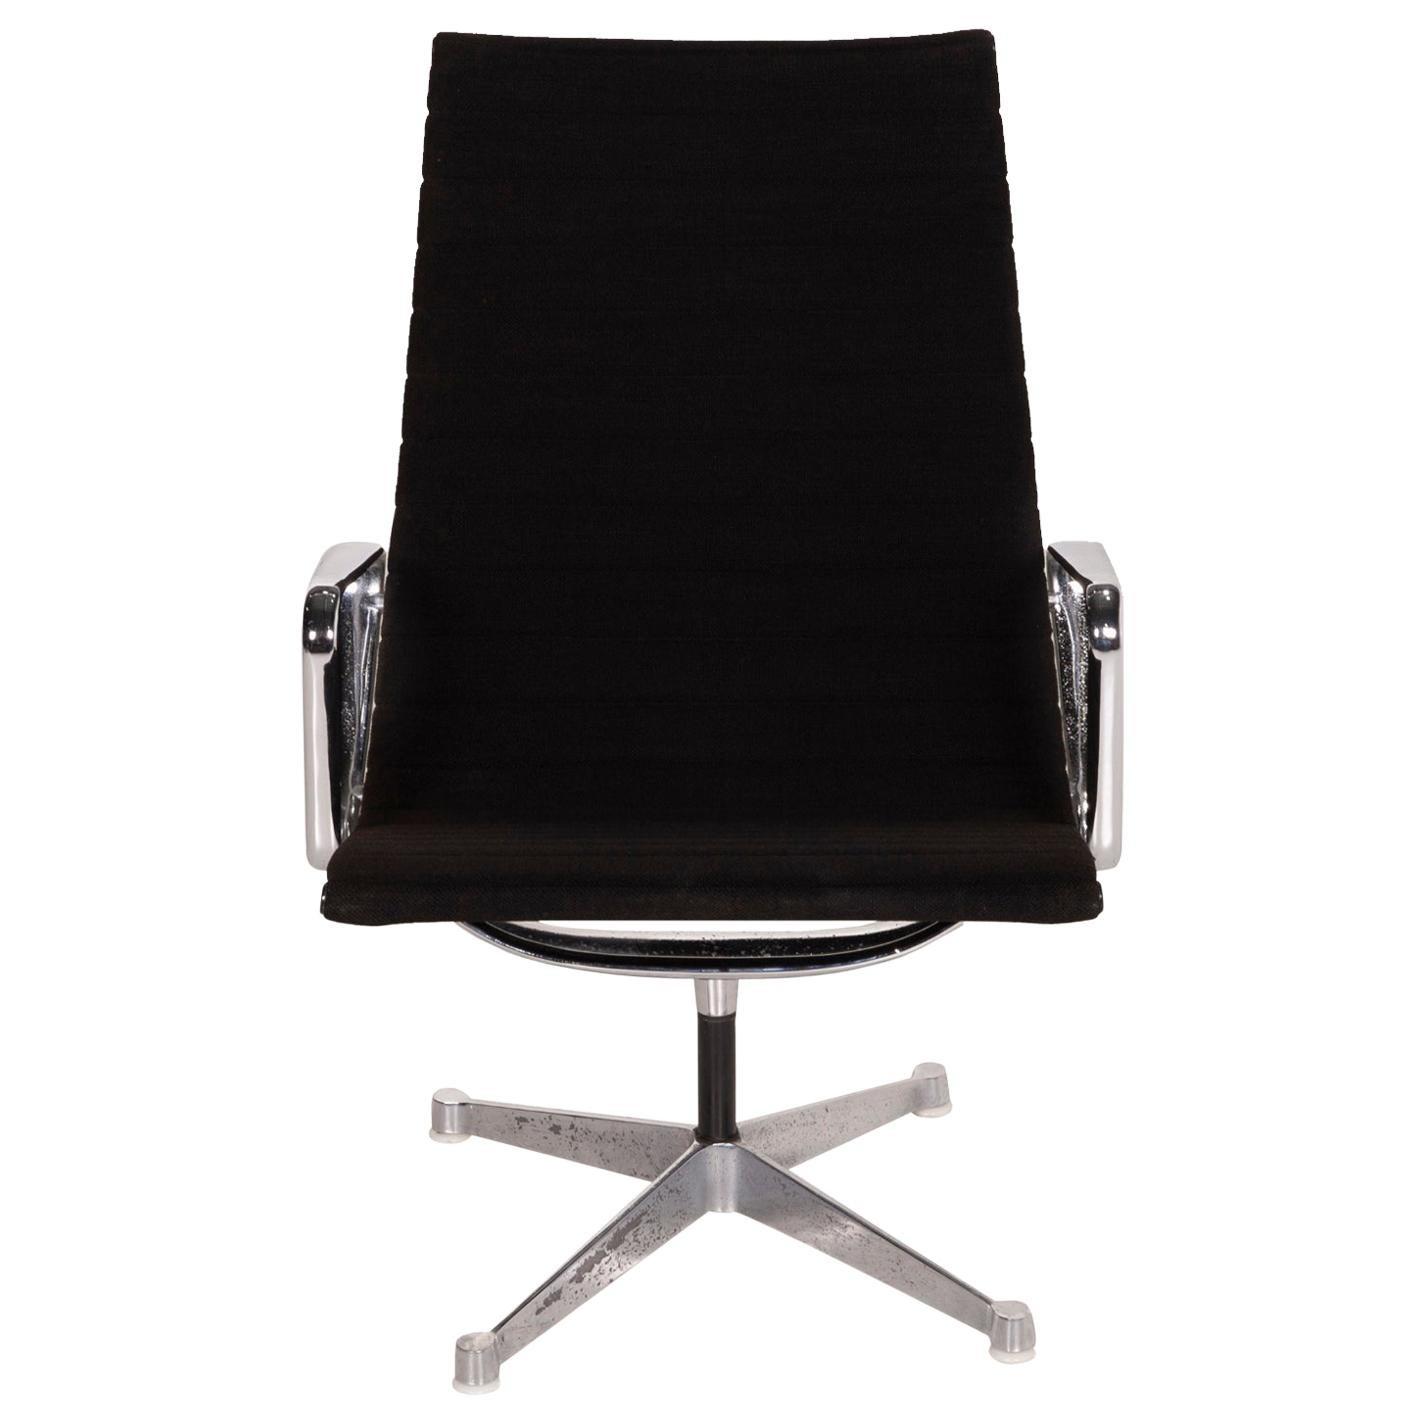 Vitra Fabric Armchair Black Hermann Miller Aluminum Chair